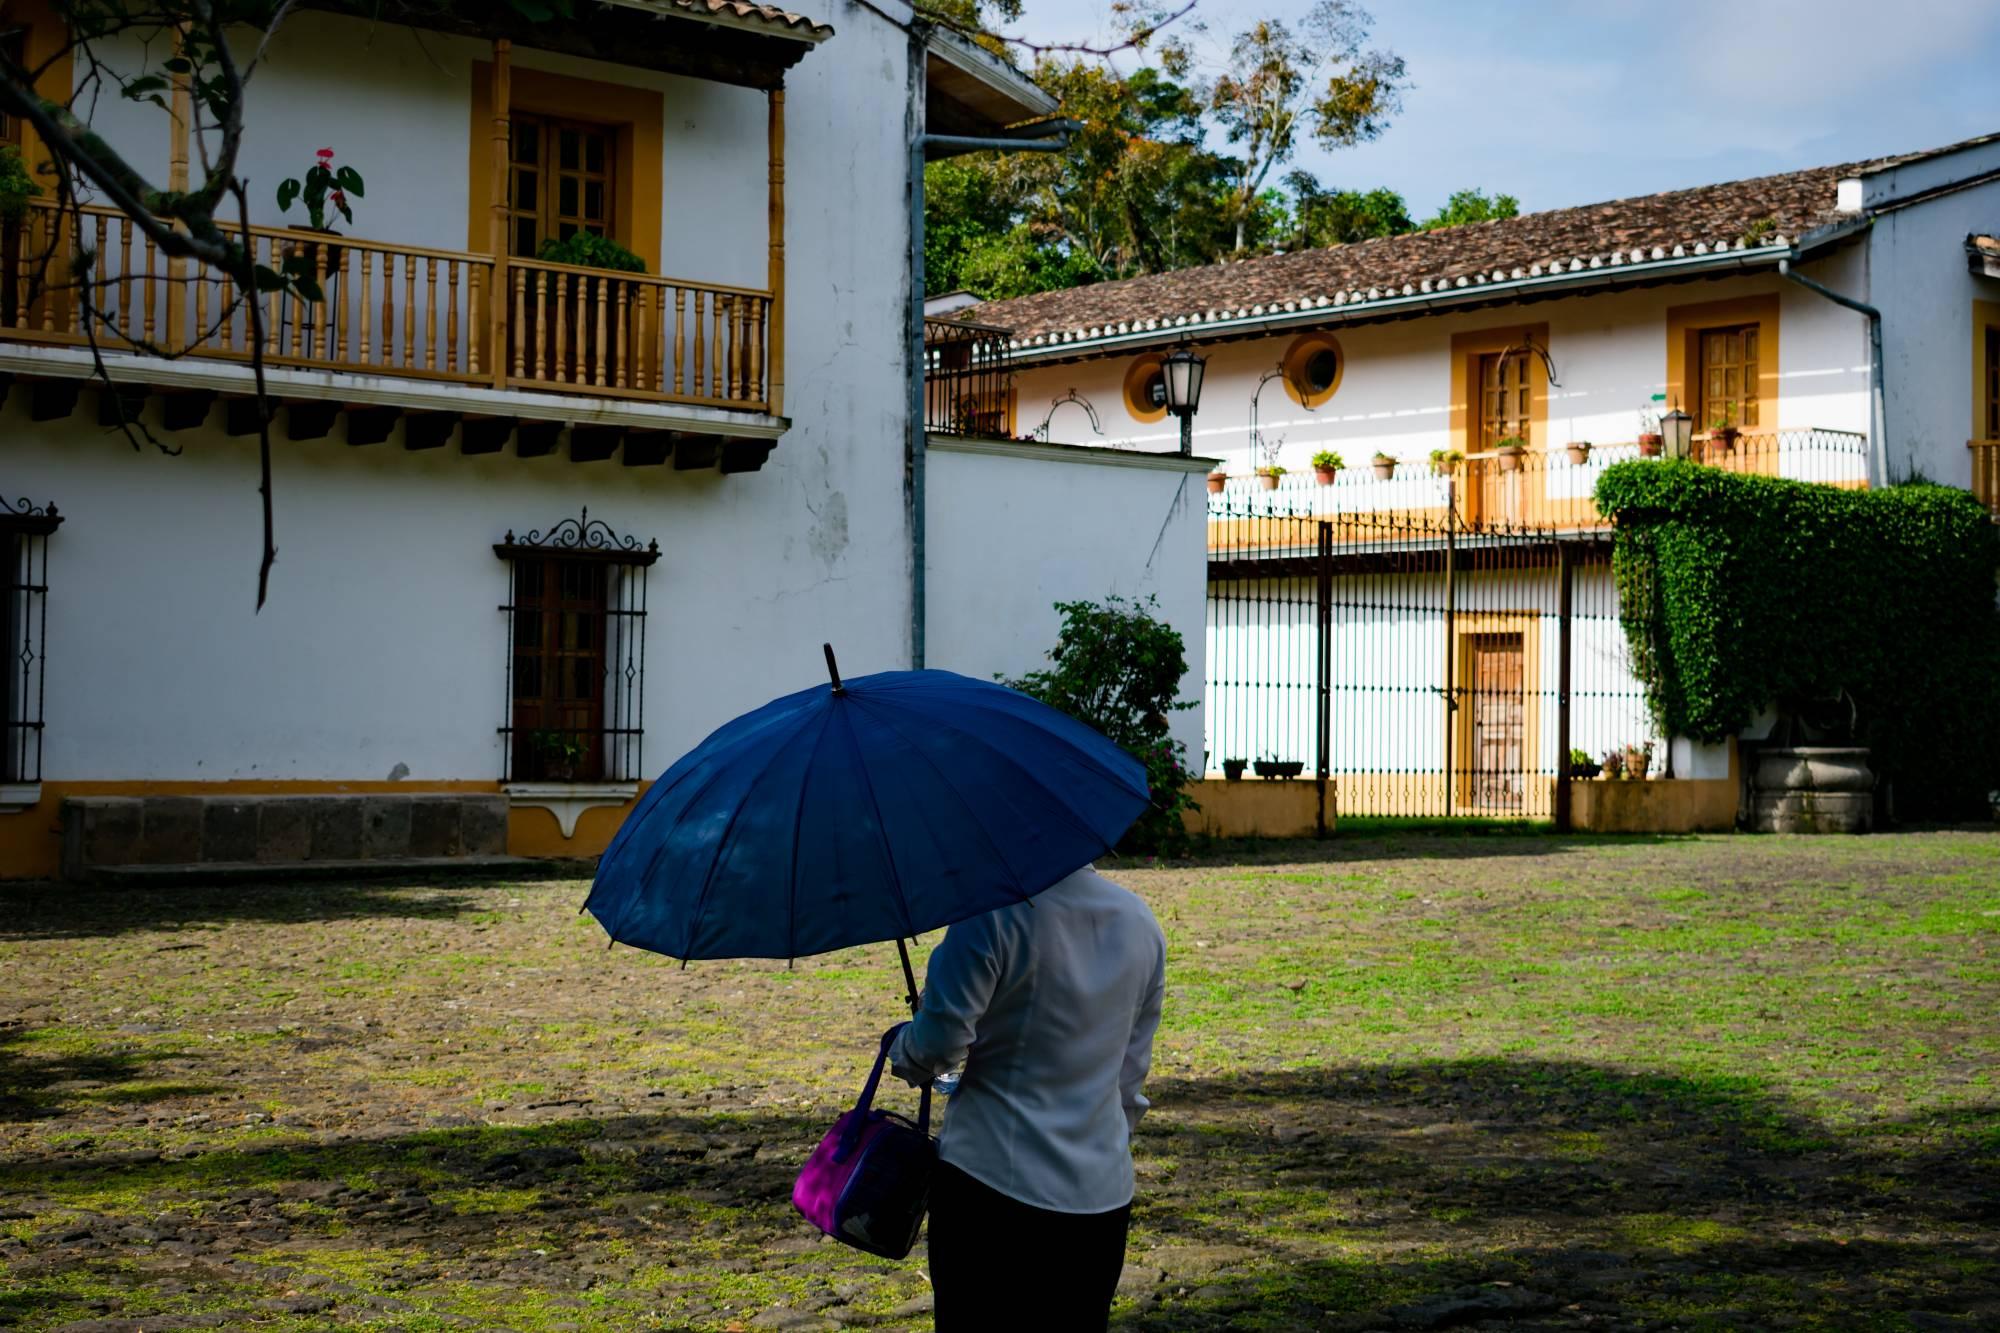 Xalapa Xico And Coatepec Tour From Veracruz Or Boca Del Rio